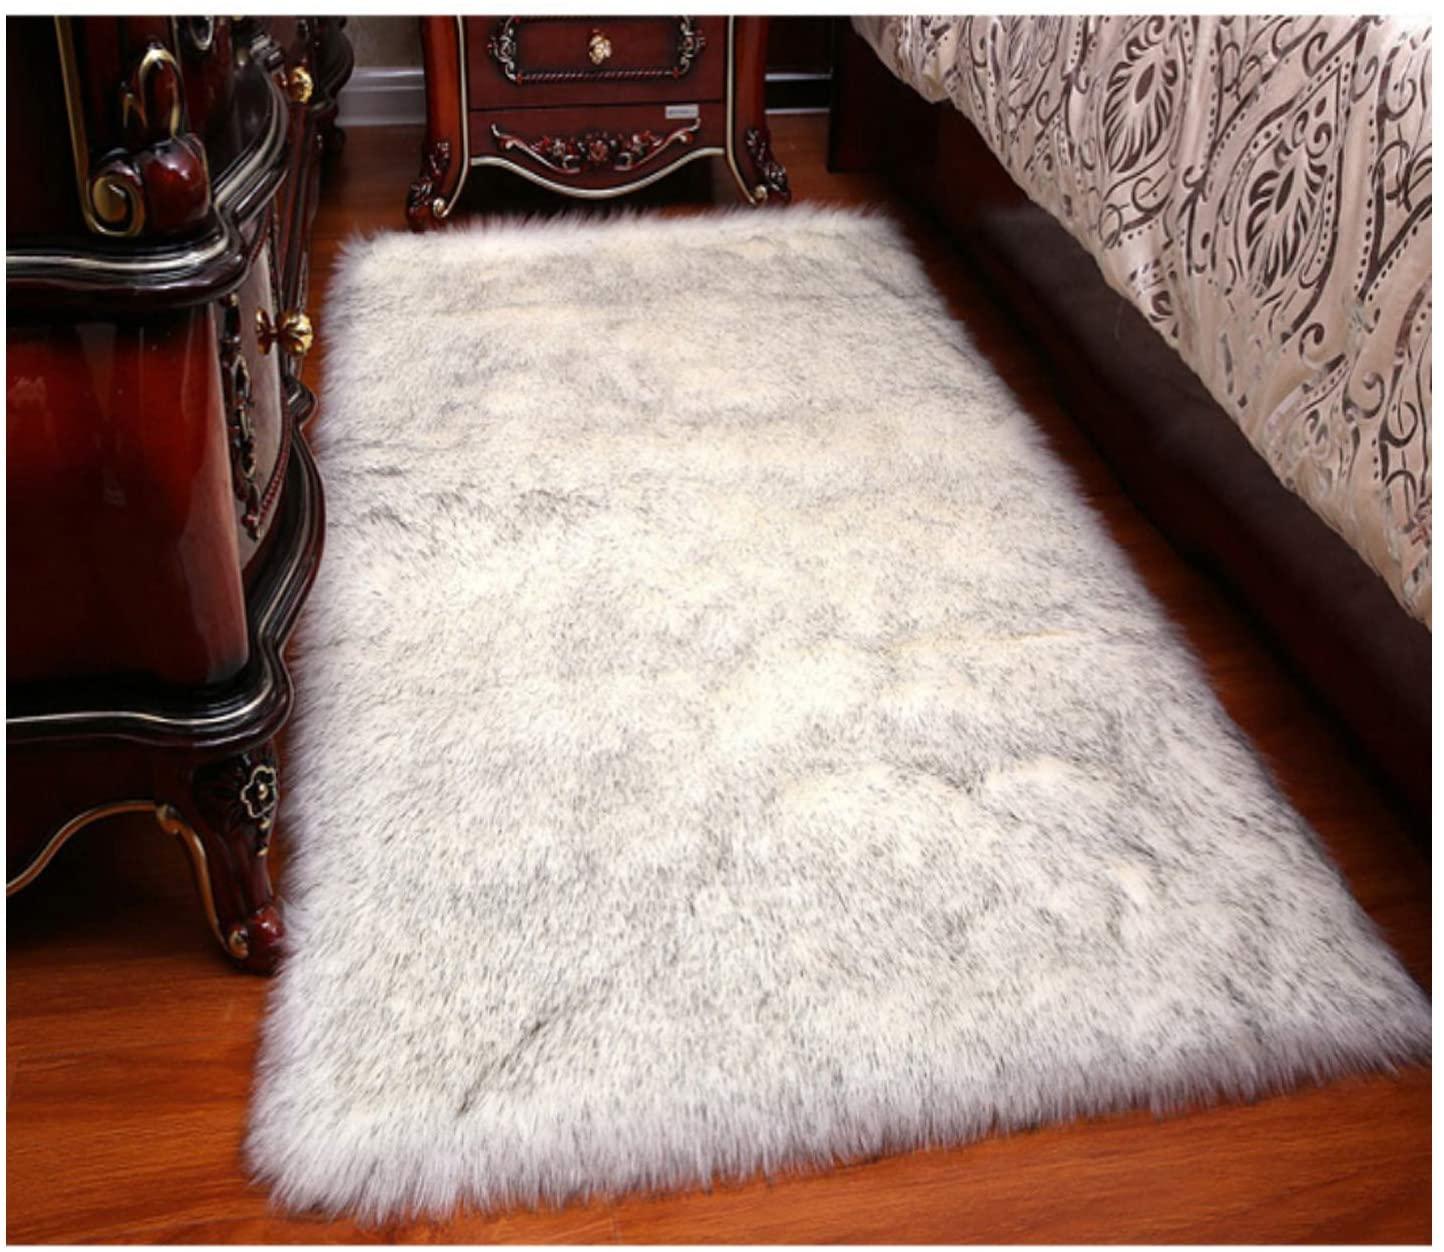 Elhouse Home Decor Rectangle Rugs Faux Fur Sheepskin Area Rug Shaggy Carpet Fluffy Rug for Baby Bedroom,2ftx3ft,White+Grey